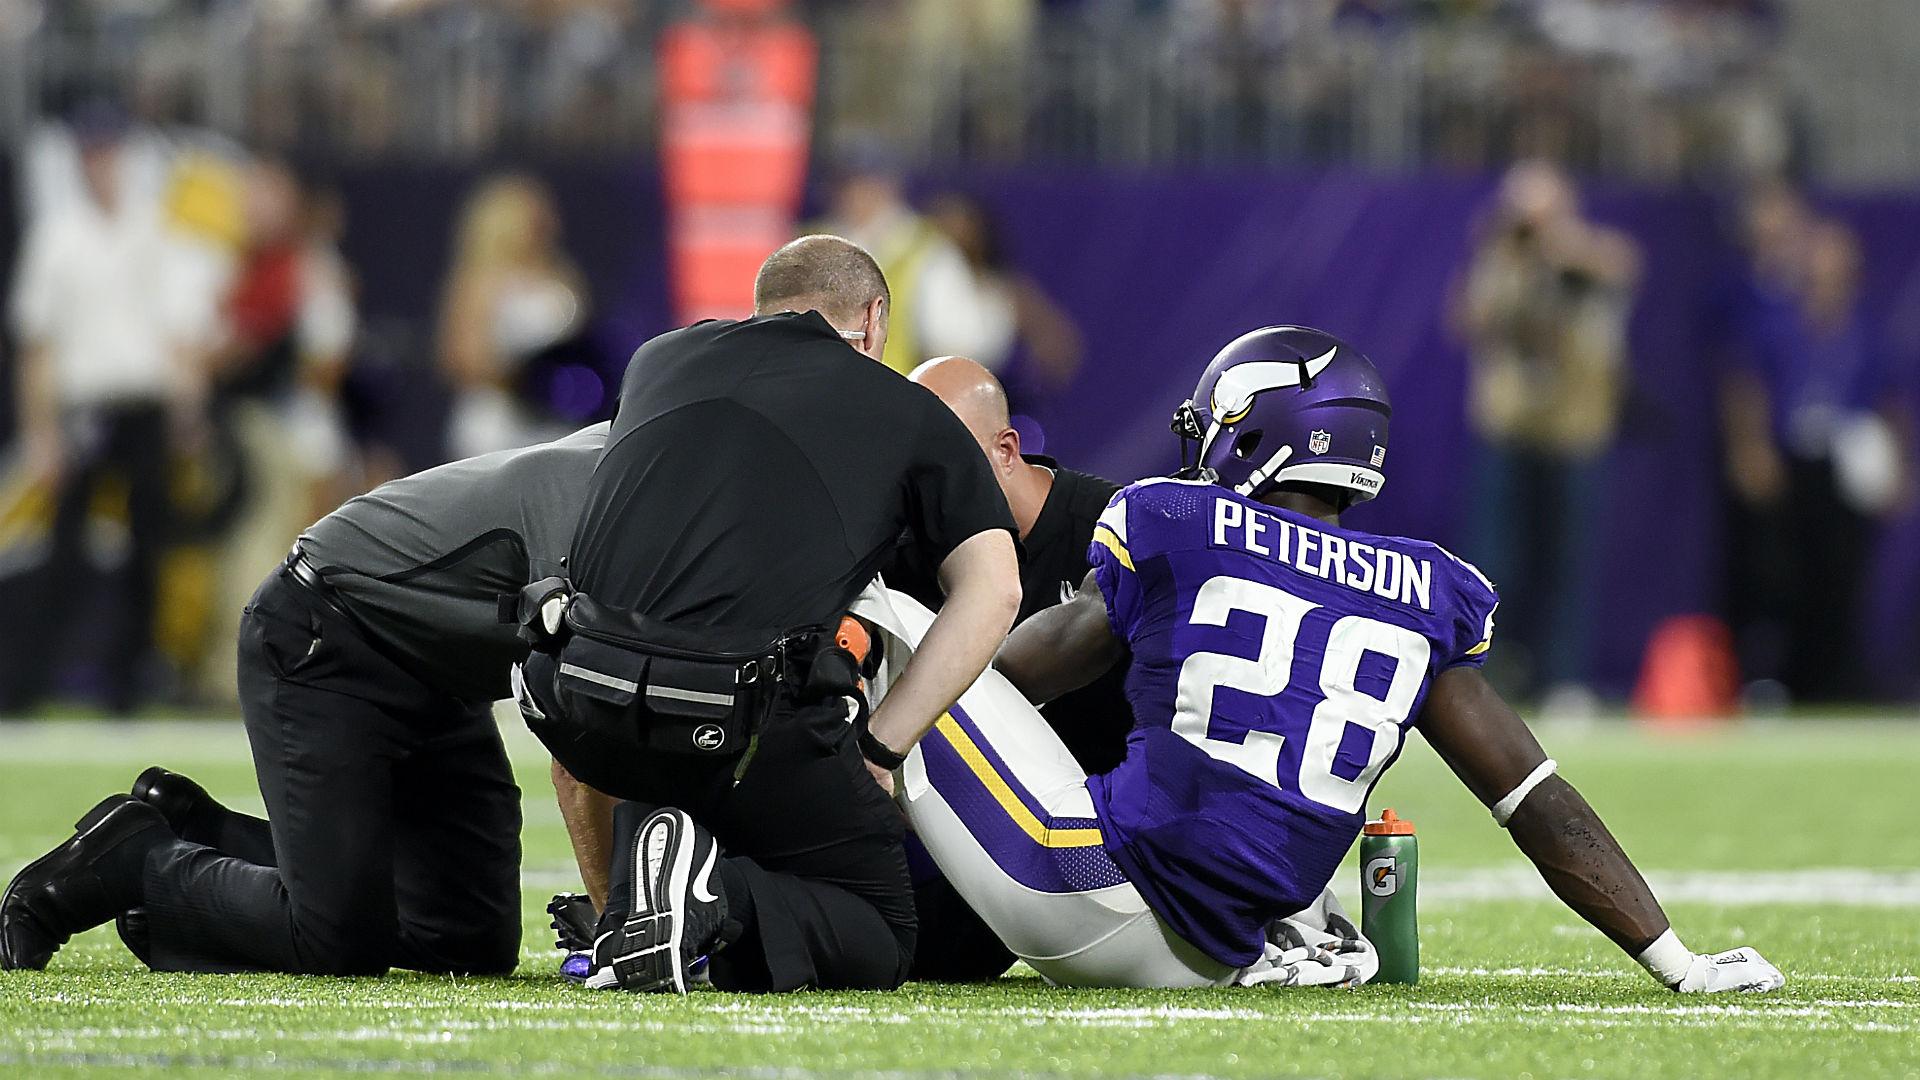 Adrian-peterson-injury-vikings-getty-ftrjpg_q8ke7hsfetl31w2w698z9iytf